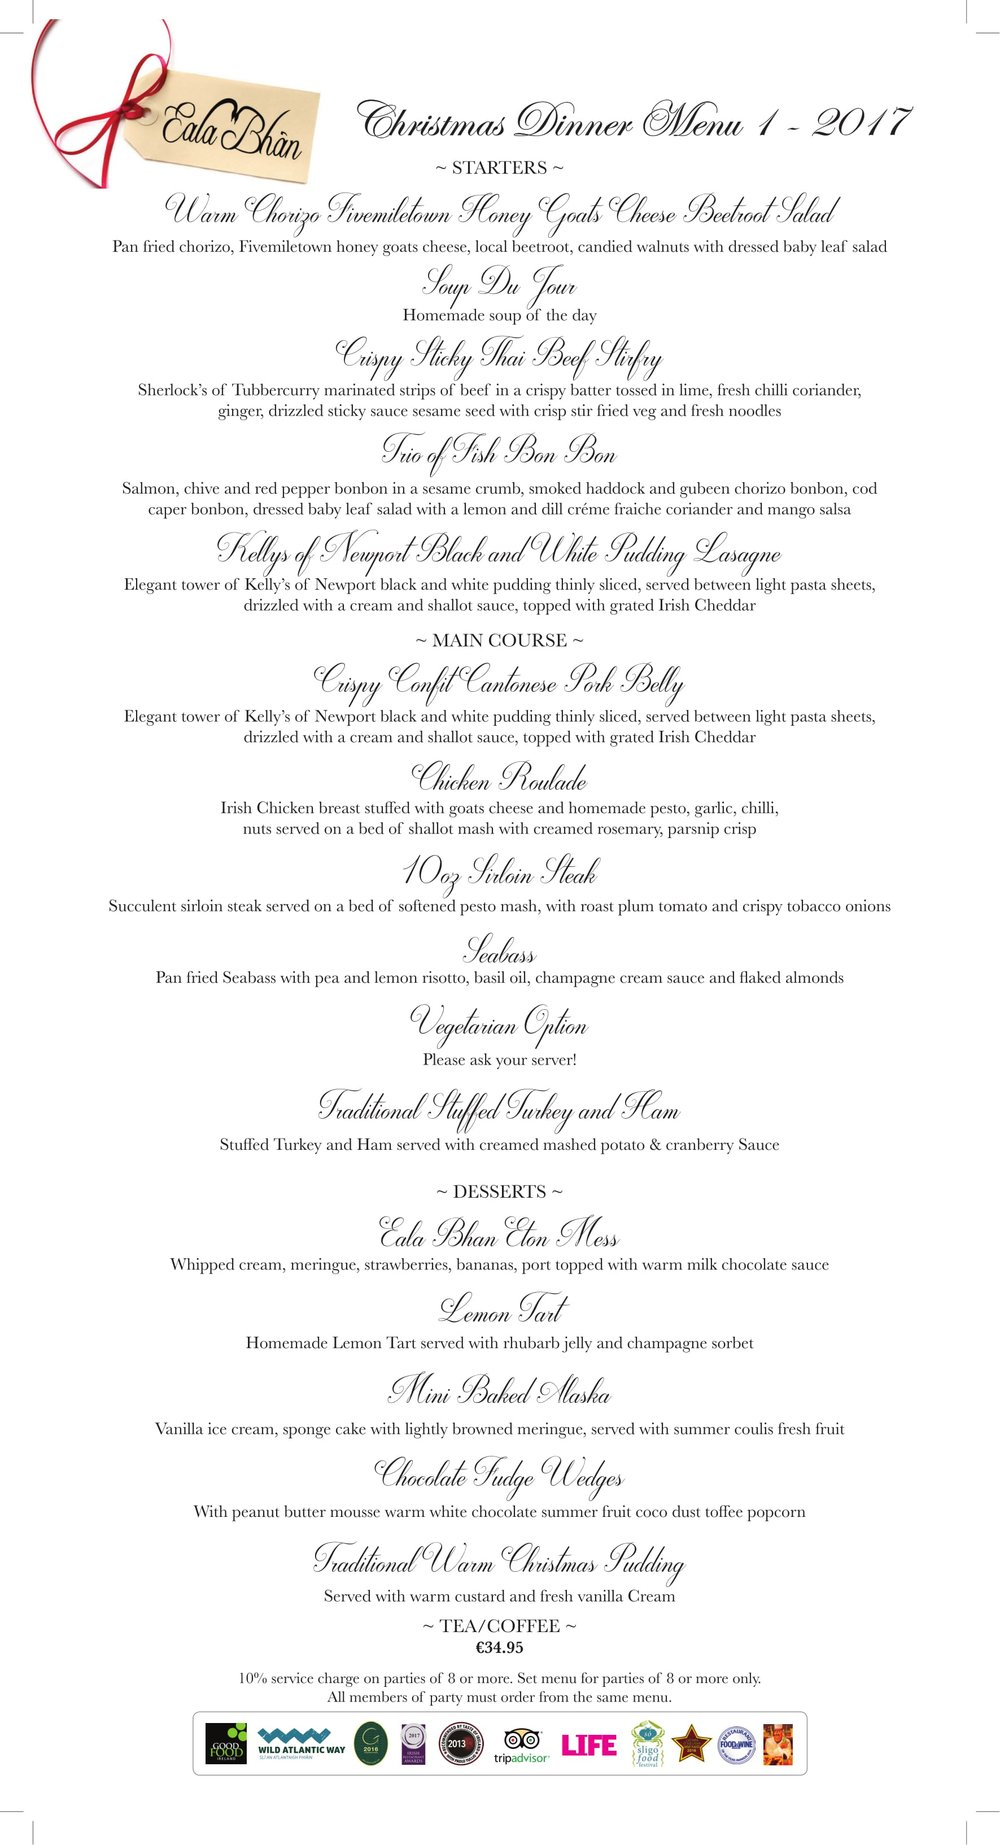 Eala Bhan Xmas Lunch Menu 2017 210x400mm-2.jpg